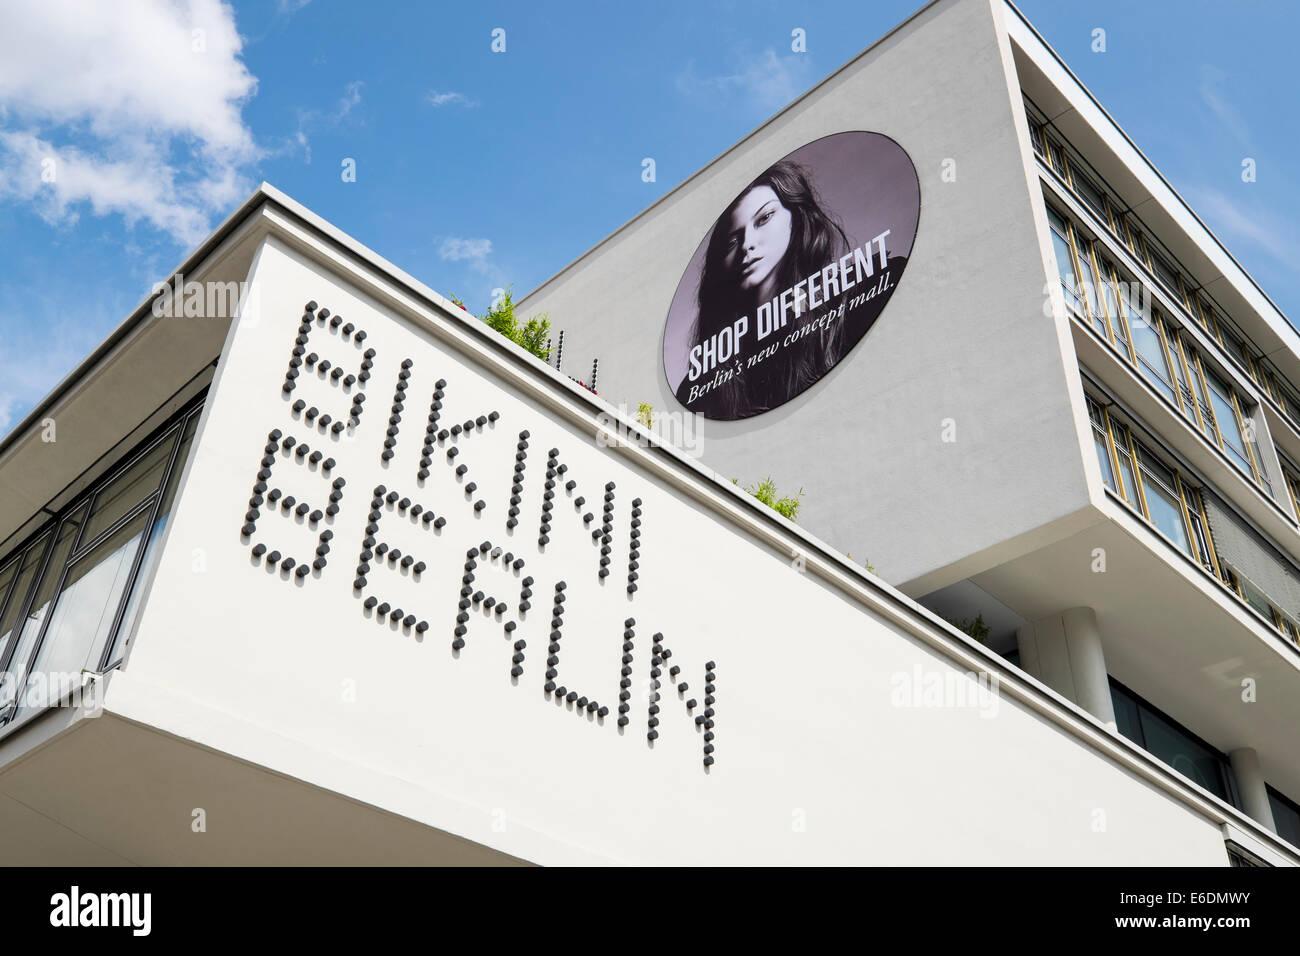 Exterior view of new Bikini Berlin shopping mall in Berlin Germany - Stock Image